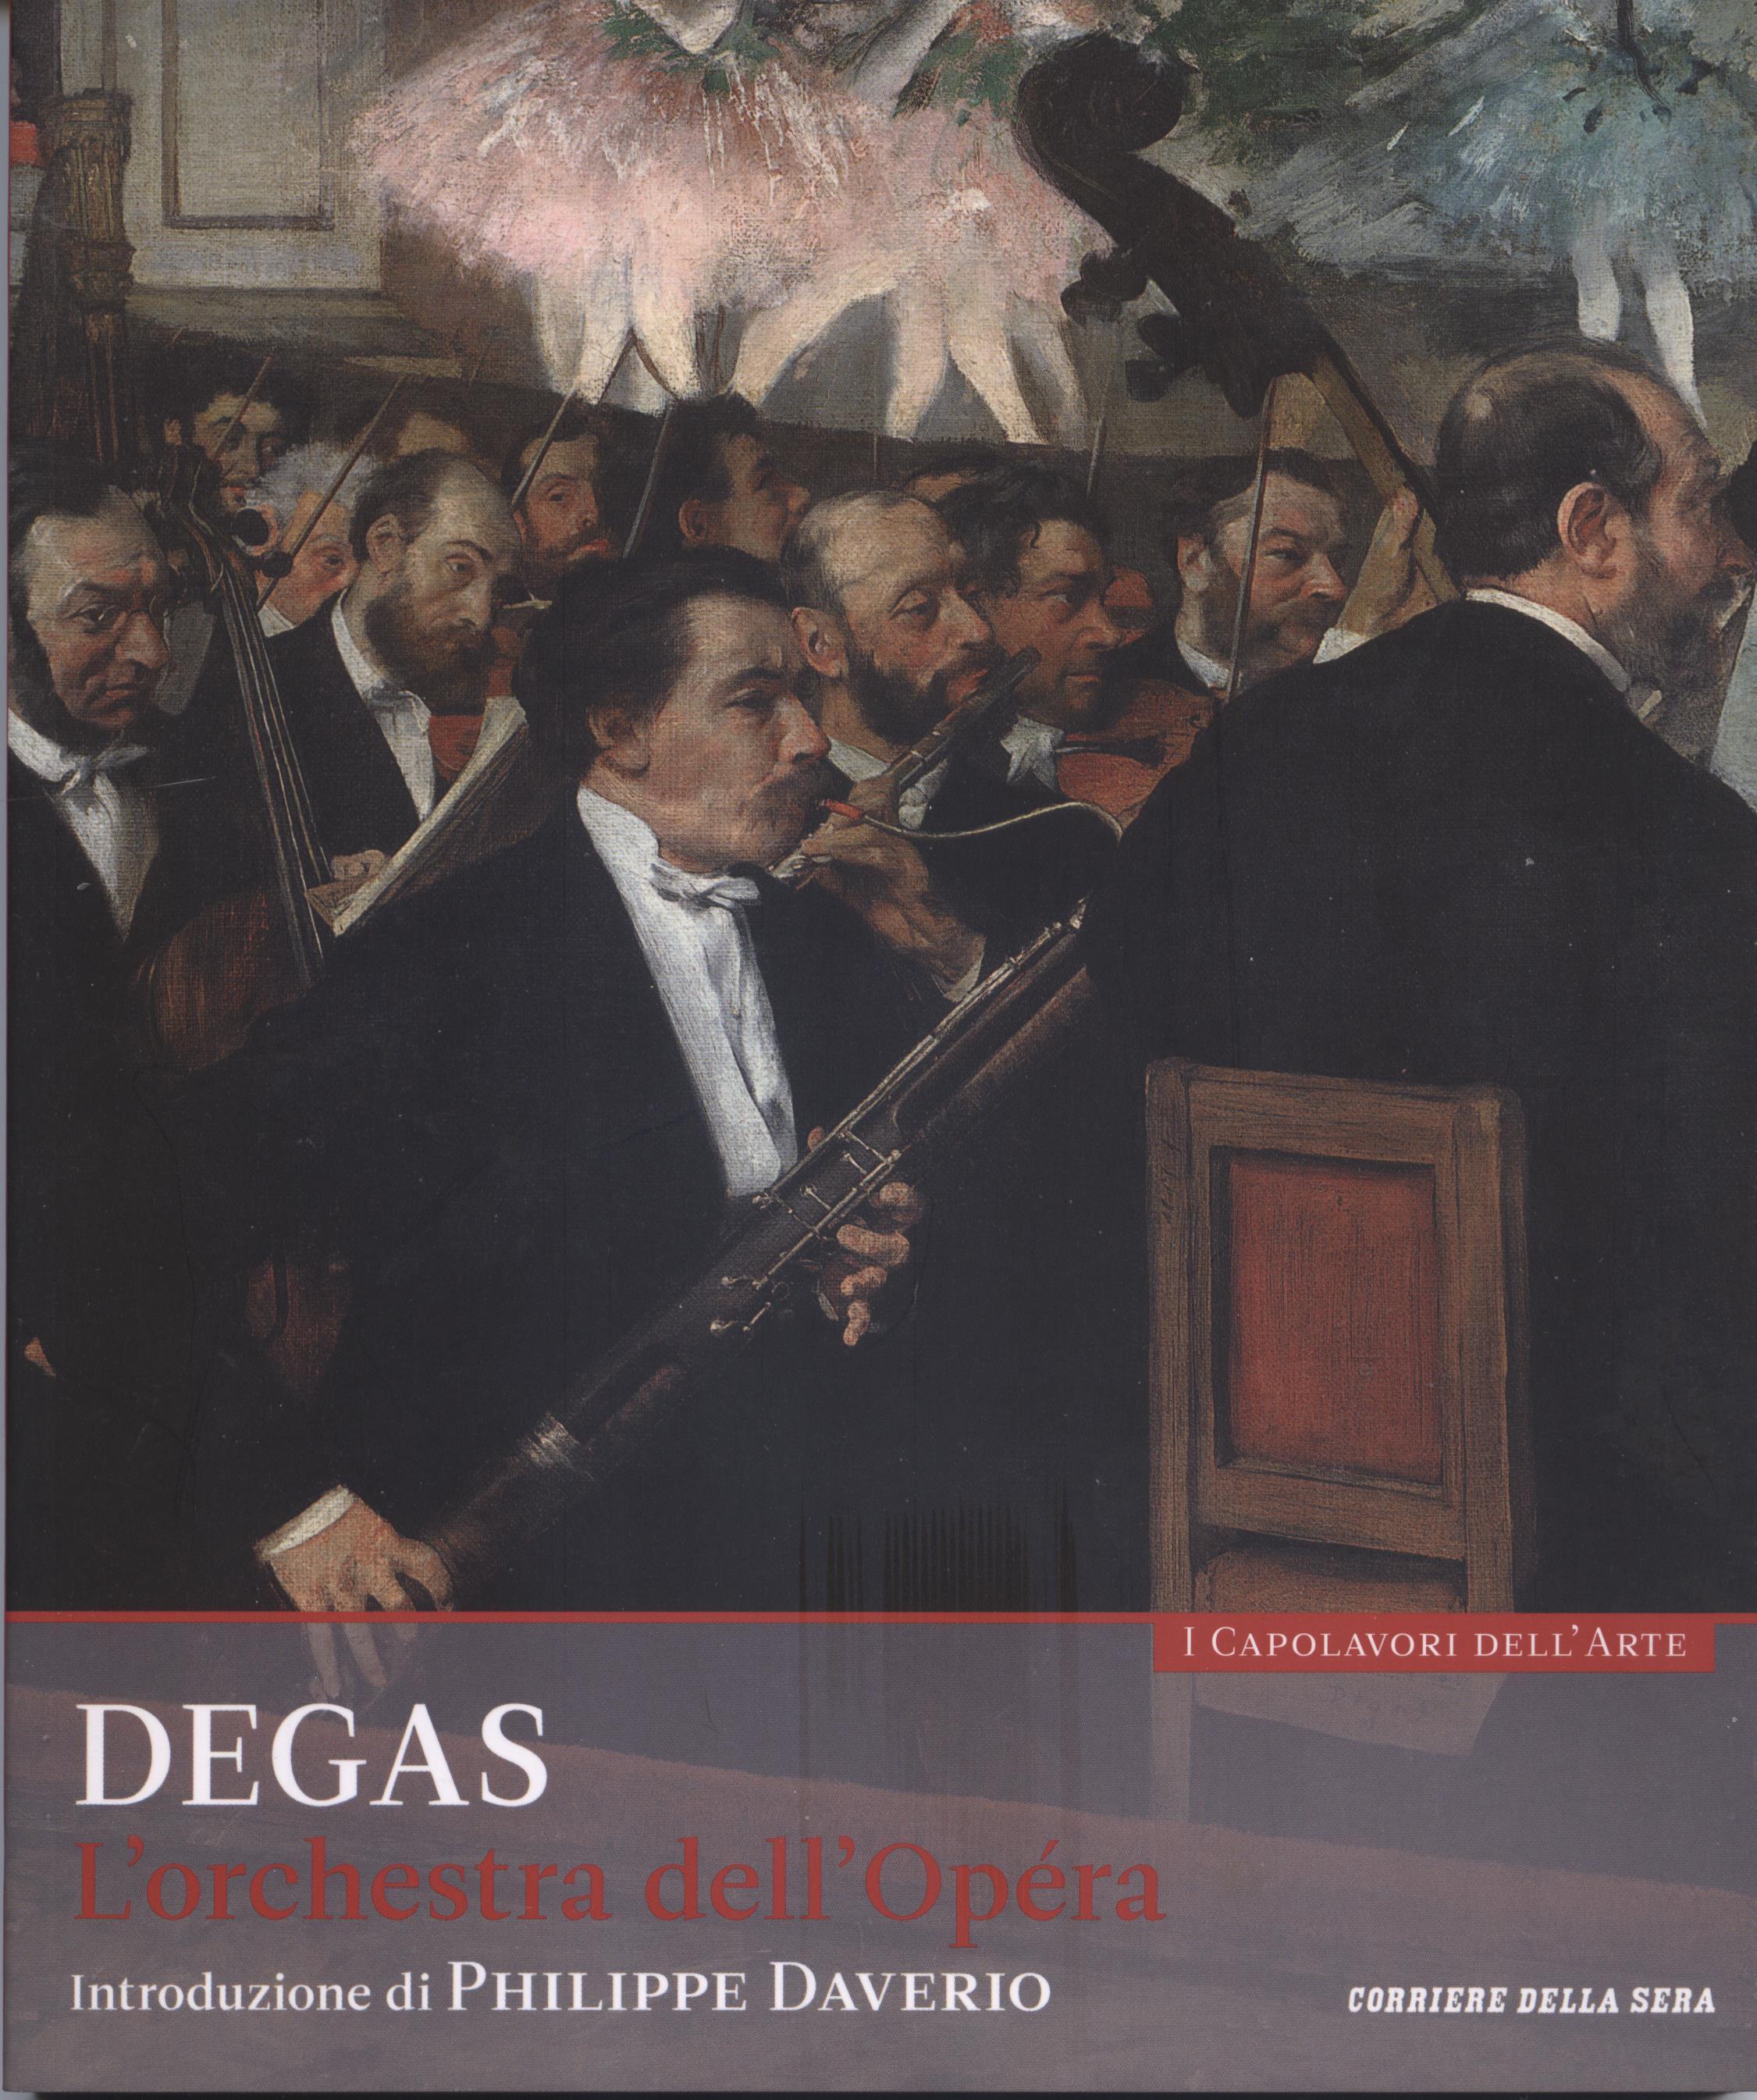 Degas - L'orchestra dell'Opéra